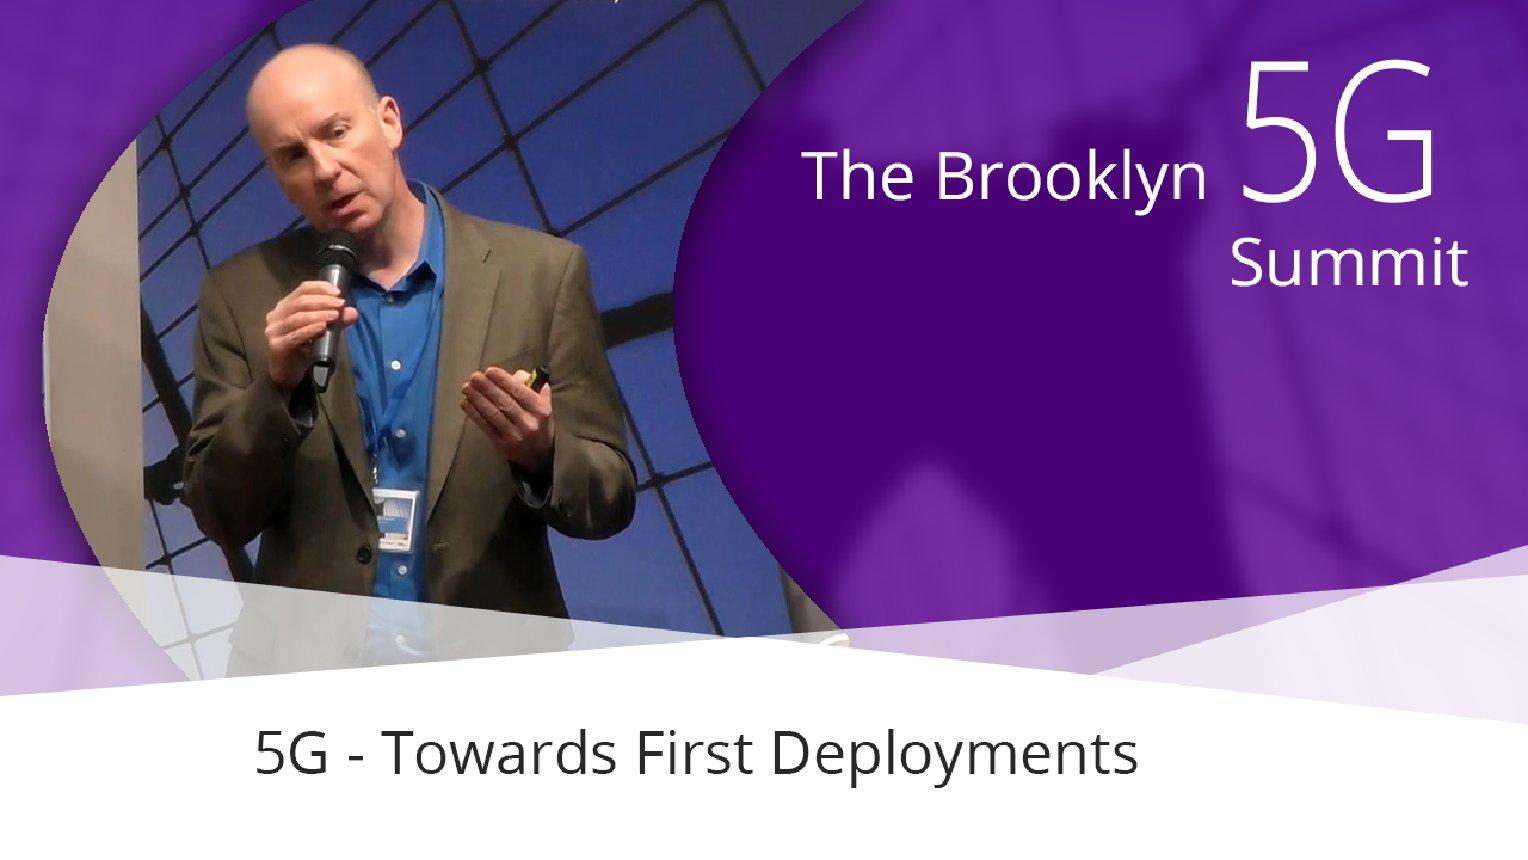 5G - Towards First Deployments - Ken Stewart: Brooklyn 5G Summit 2017